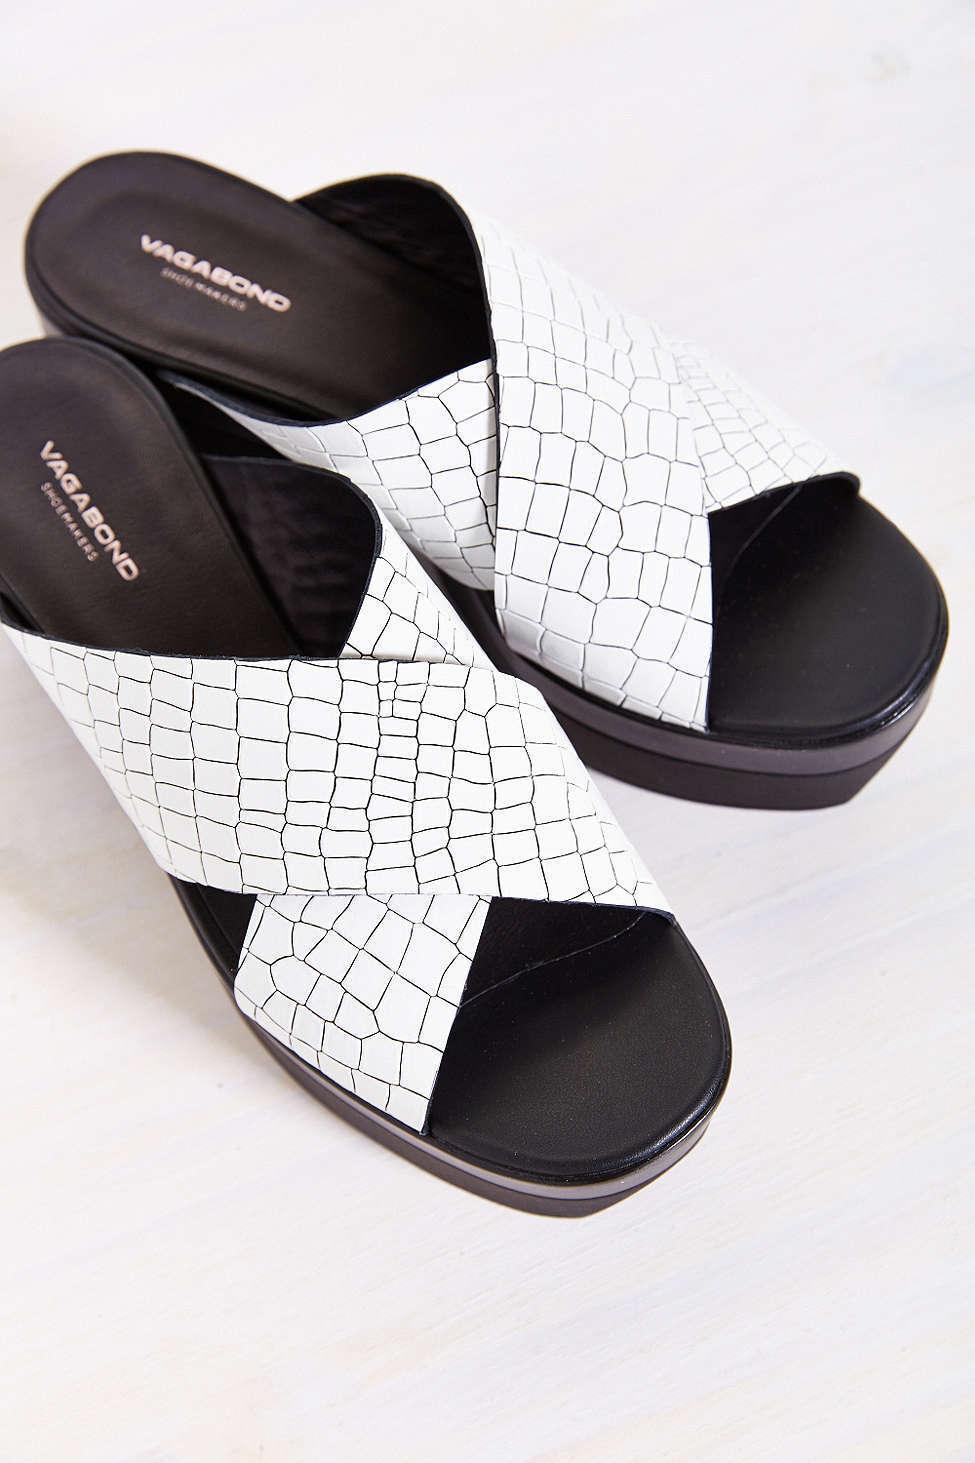 Vagabond Lindi Chunky Platform White Croc Textured Leather Slide Sandals 39 New